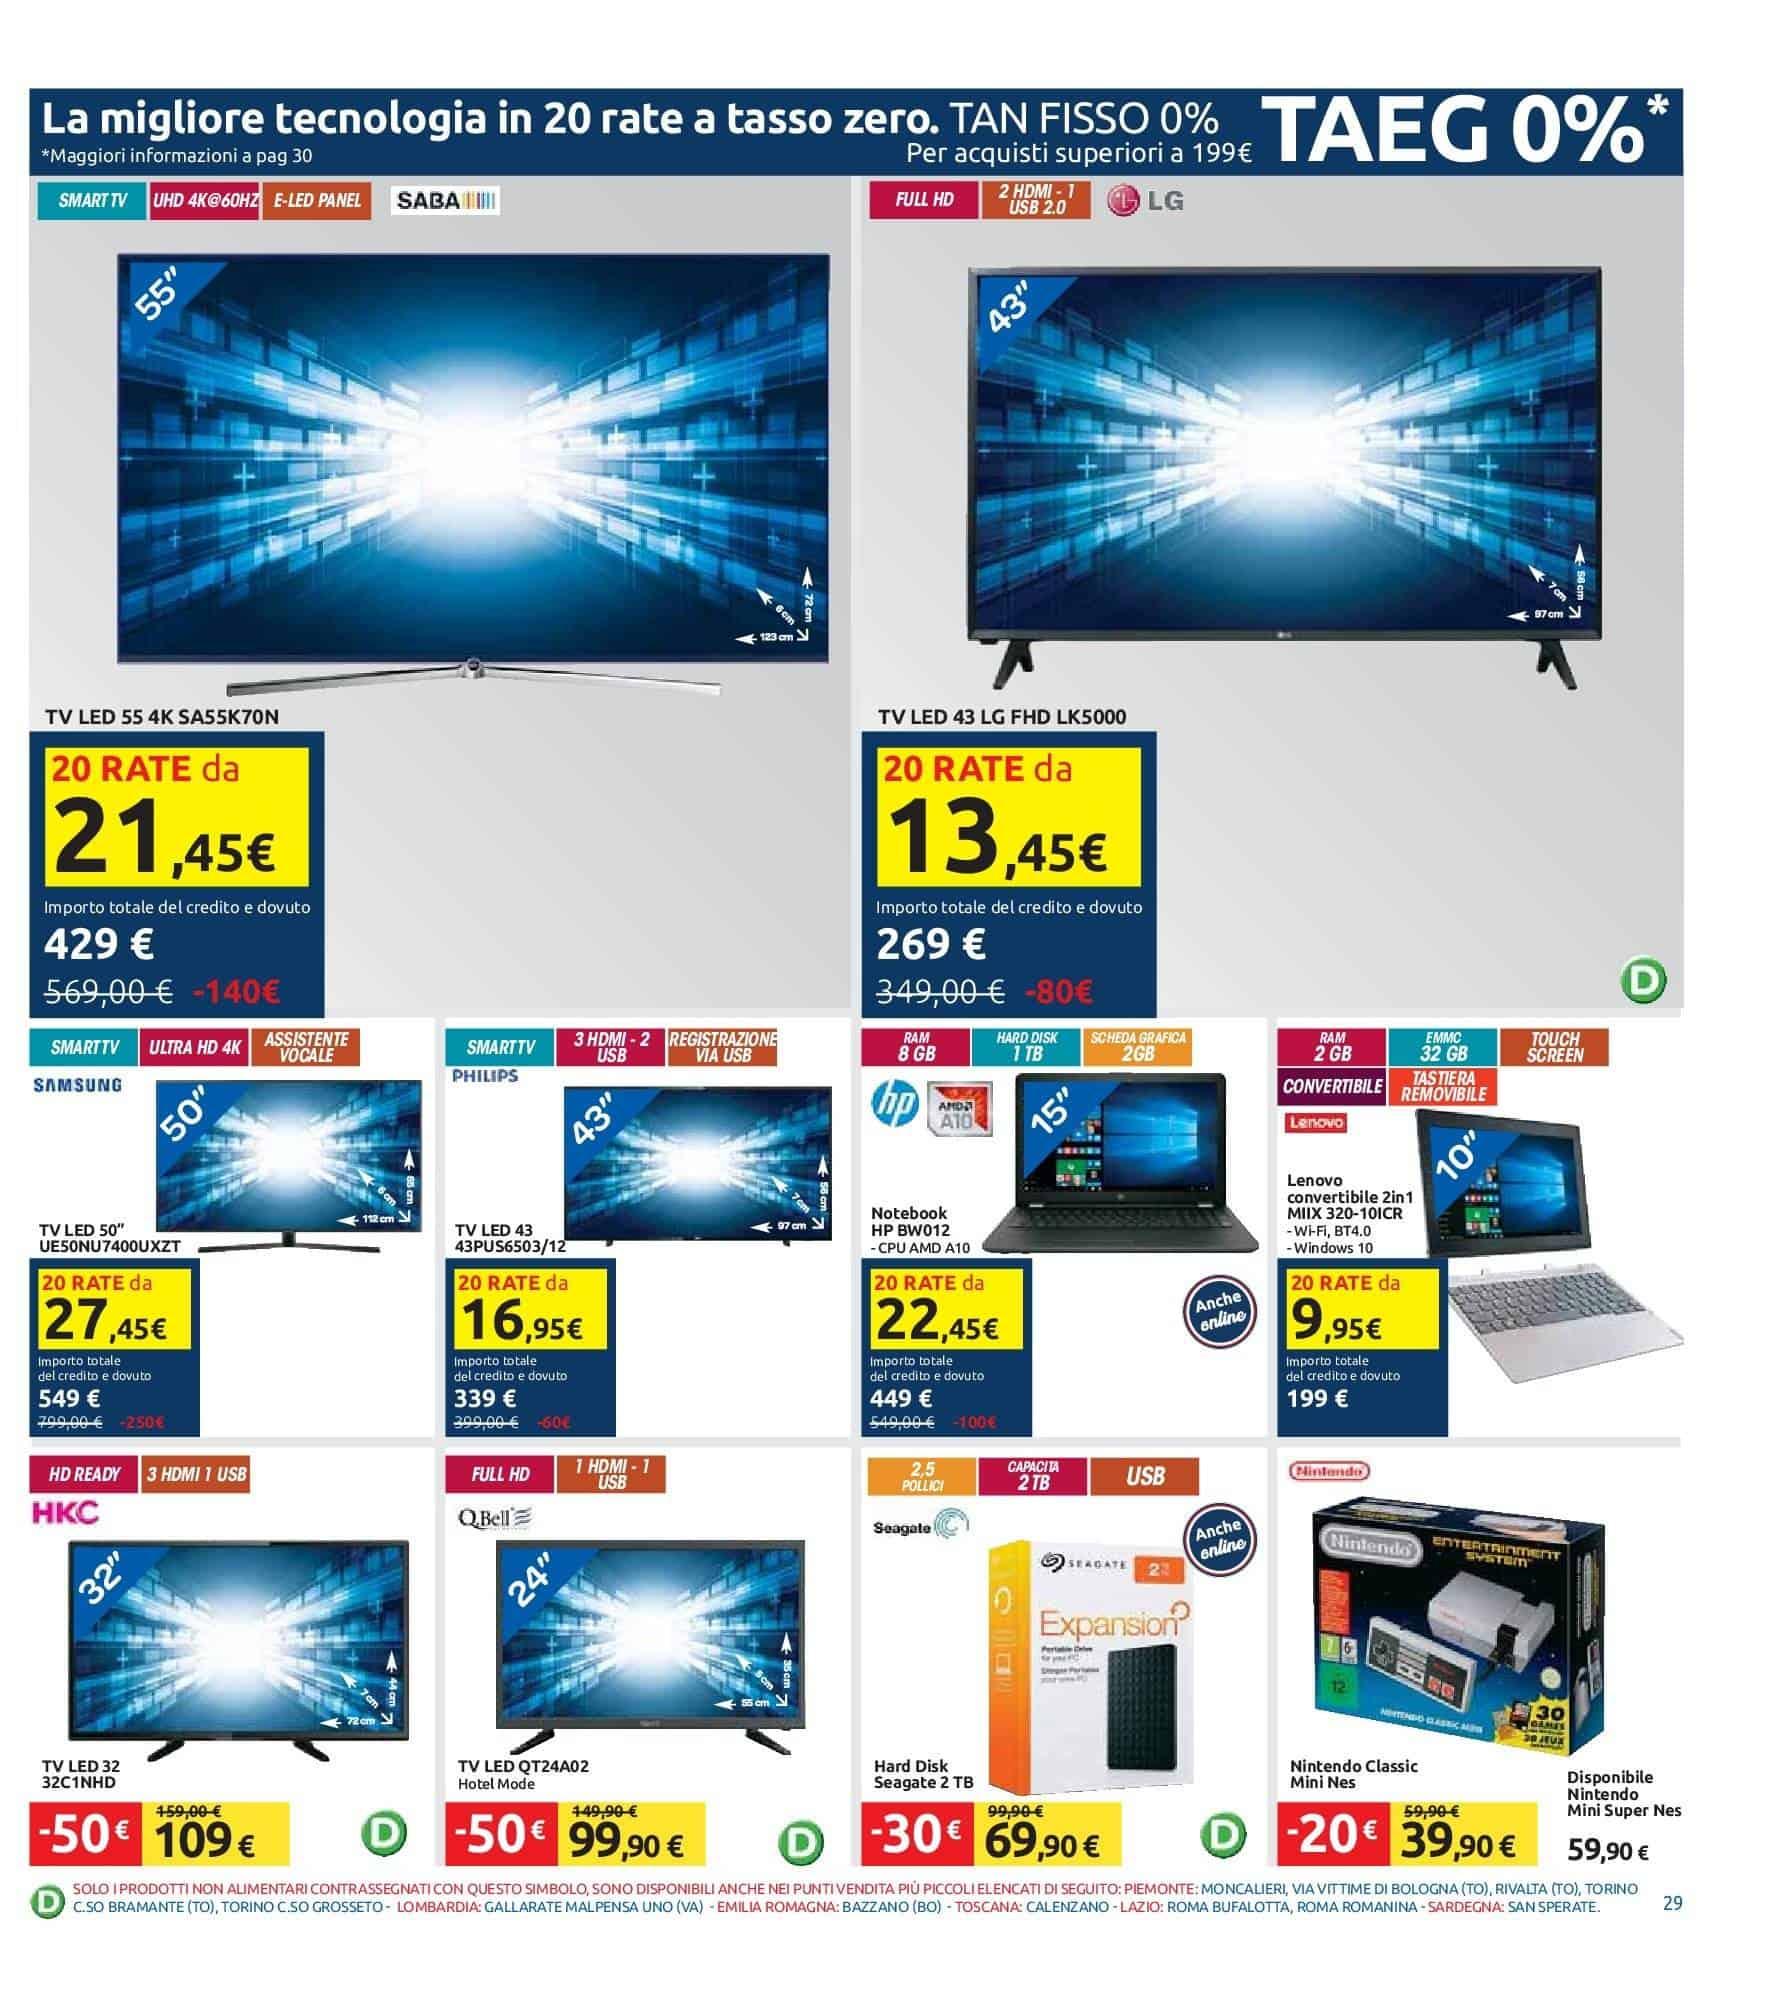 Televisori Offerti Da Carrefour